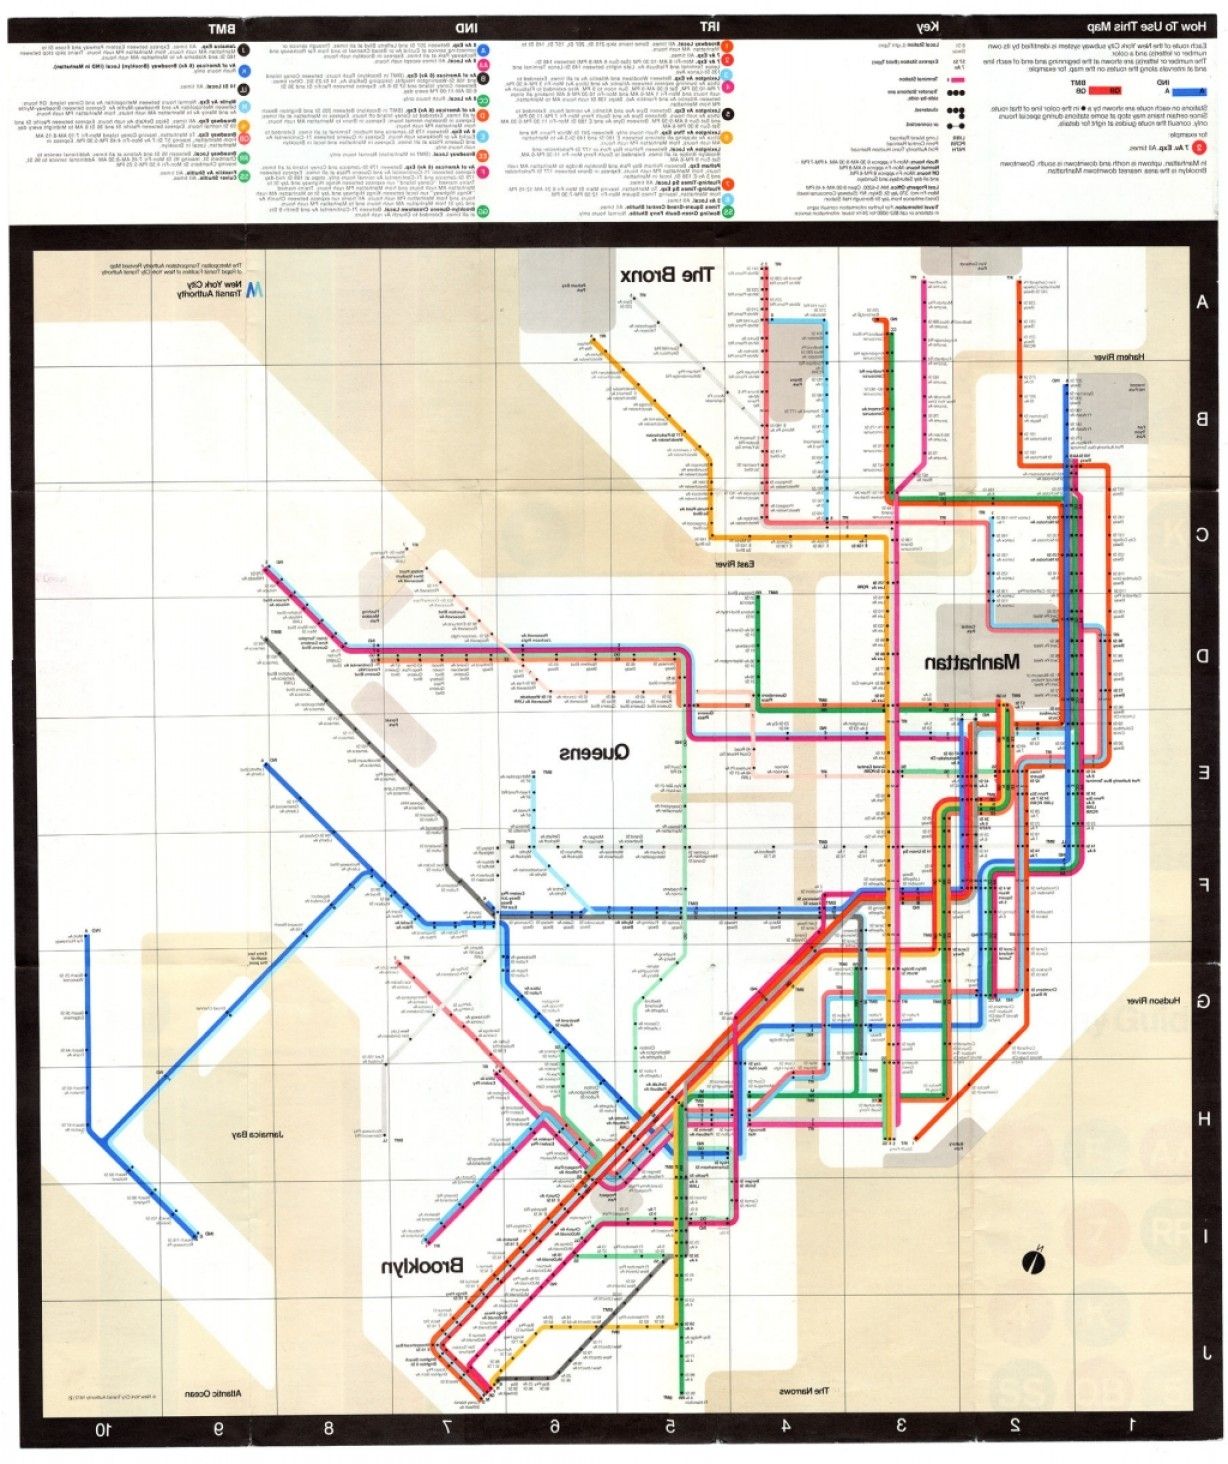 Mapcarte New York City Subway Mapmassimo Vignelli throughout Vignelli Super Bowl Map